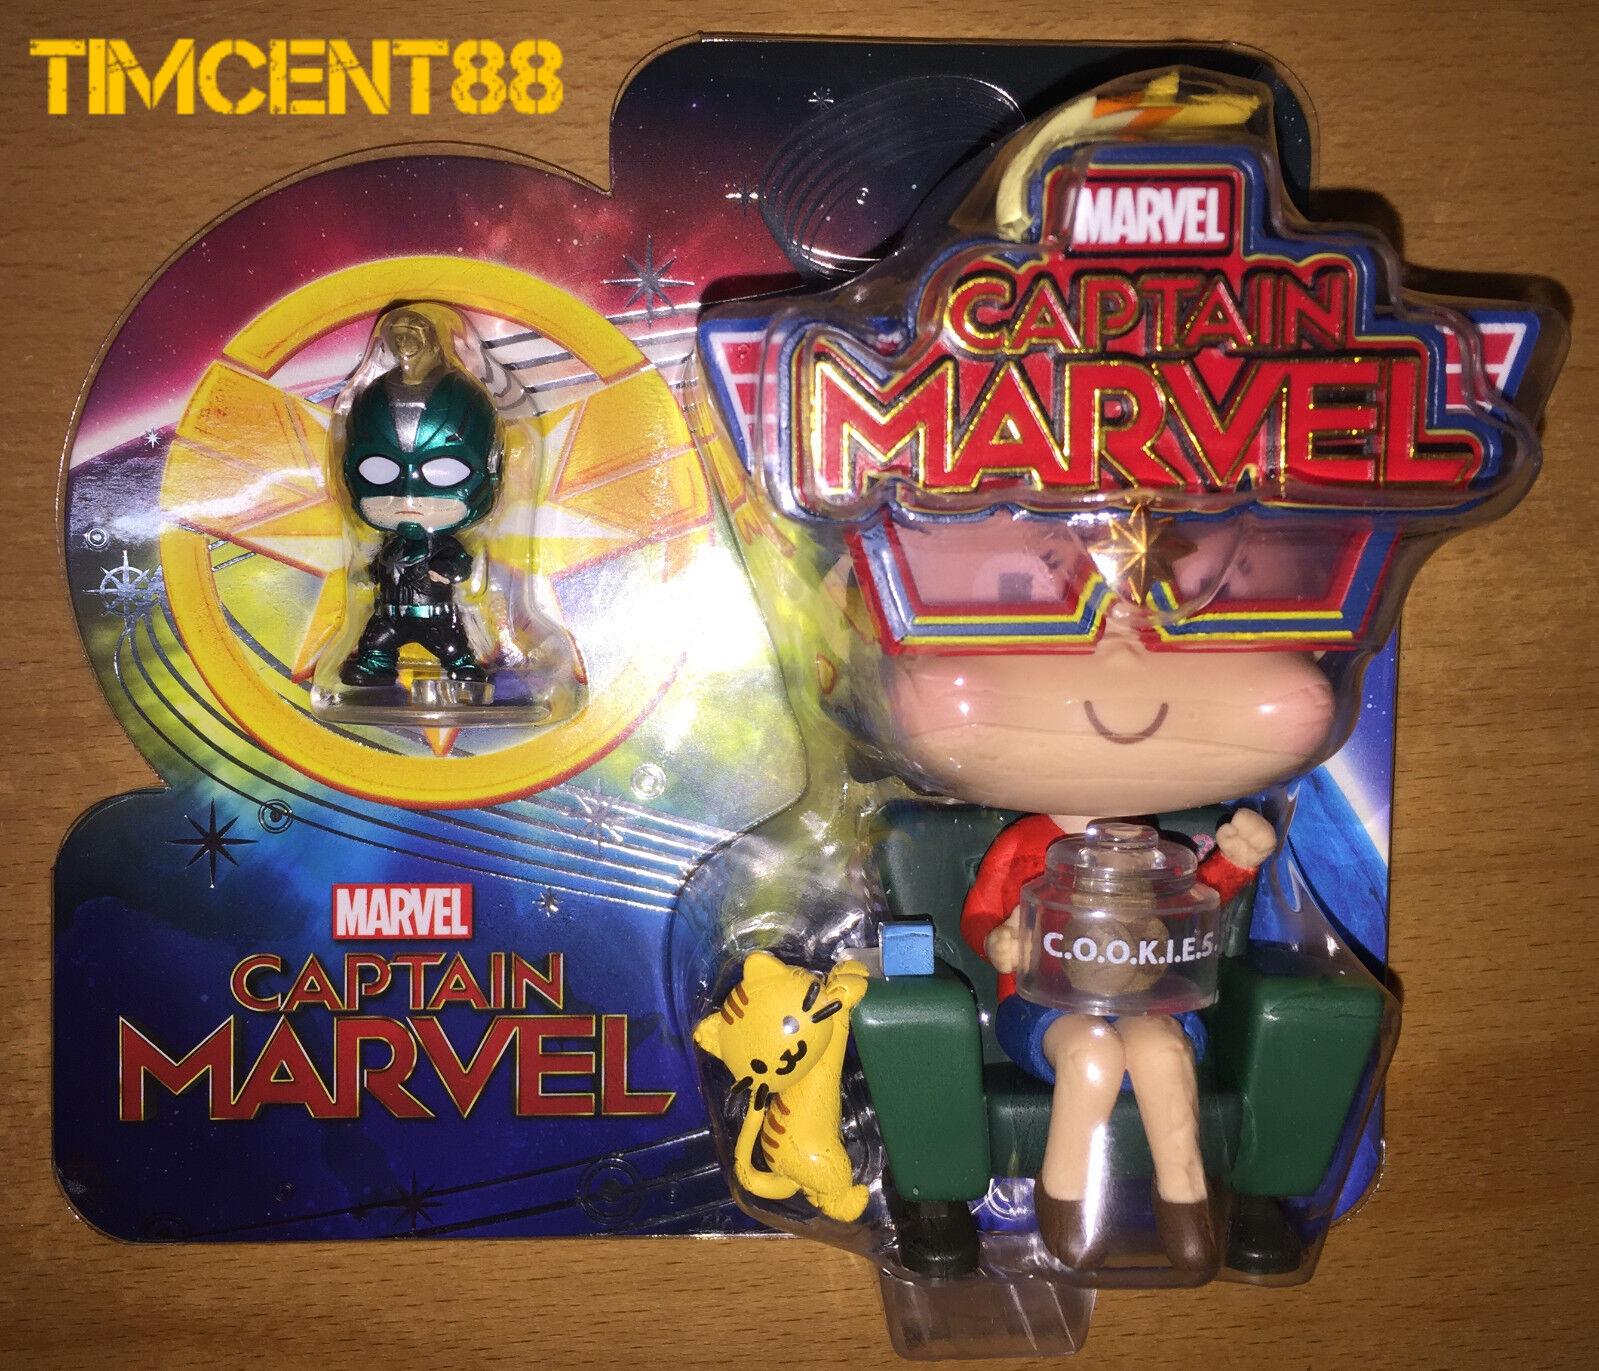 Hot Toys Cosbaby Marvel Avengers Captain Marvel Movbi Set Season Greetings 2018